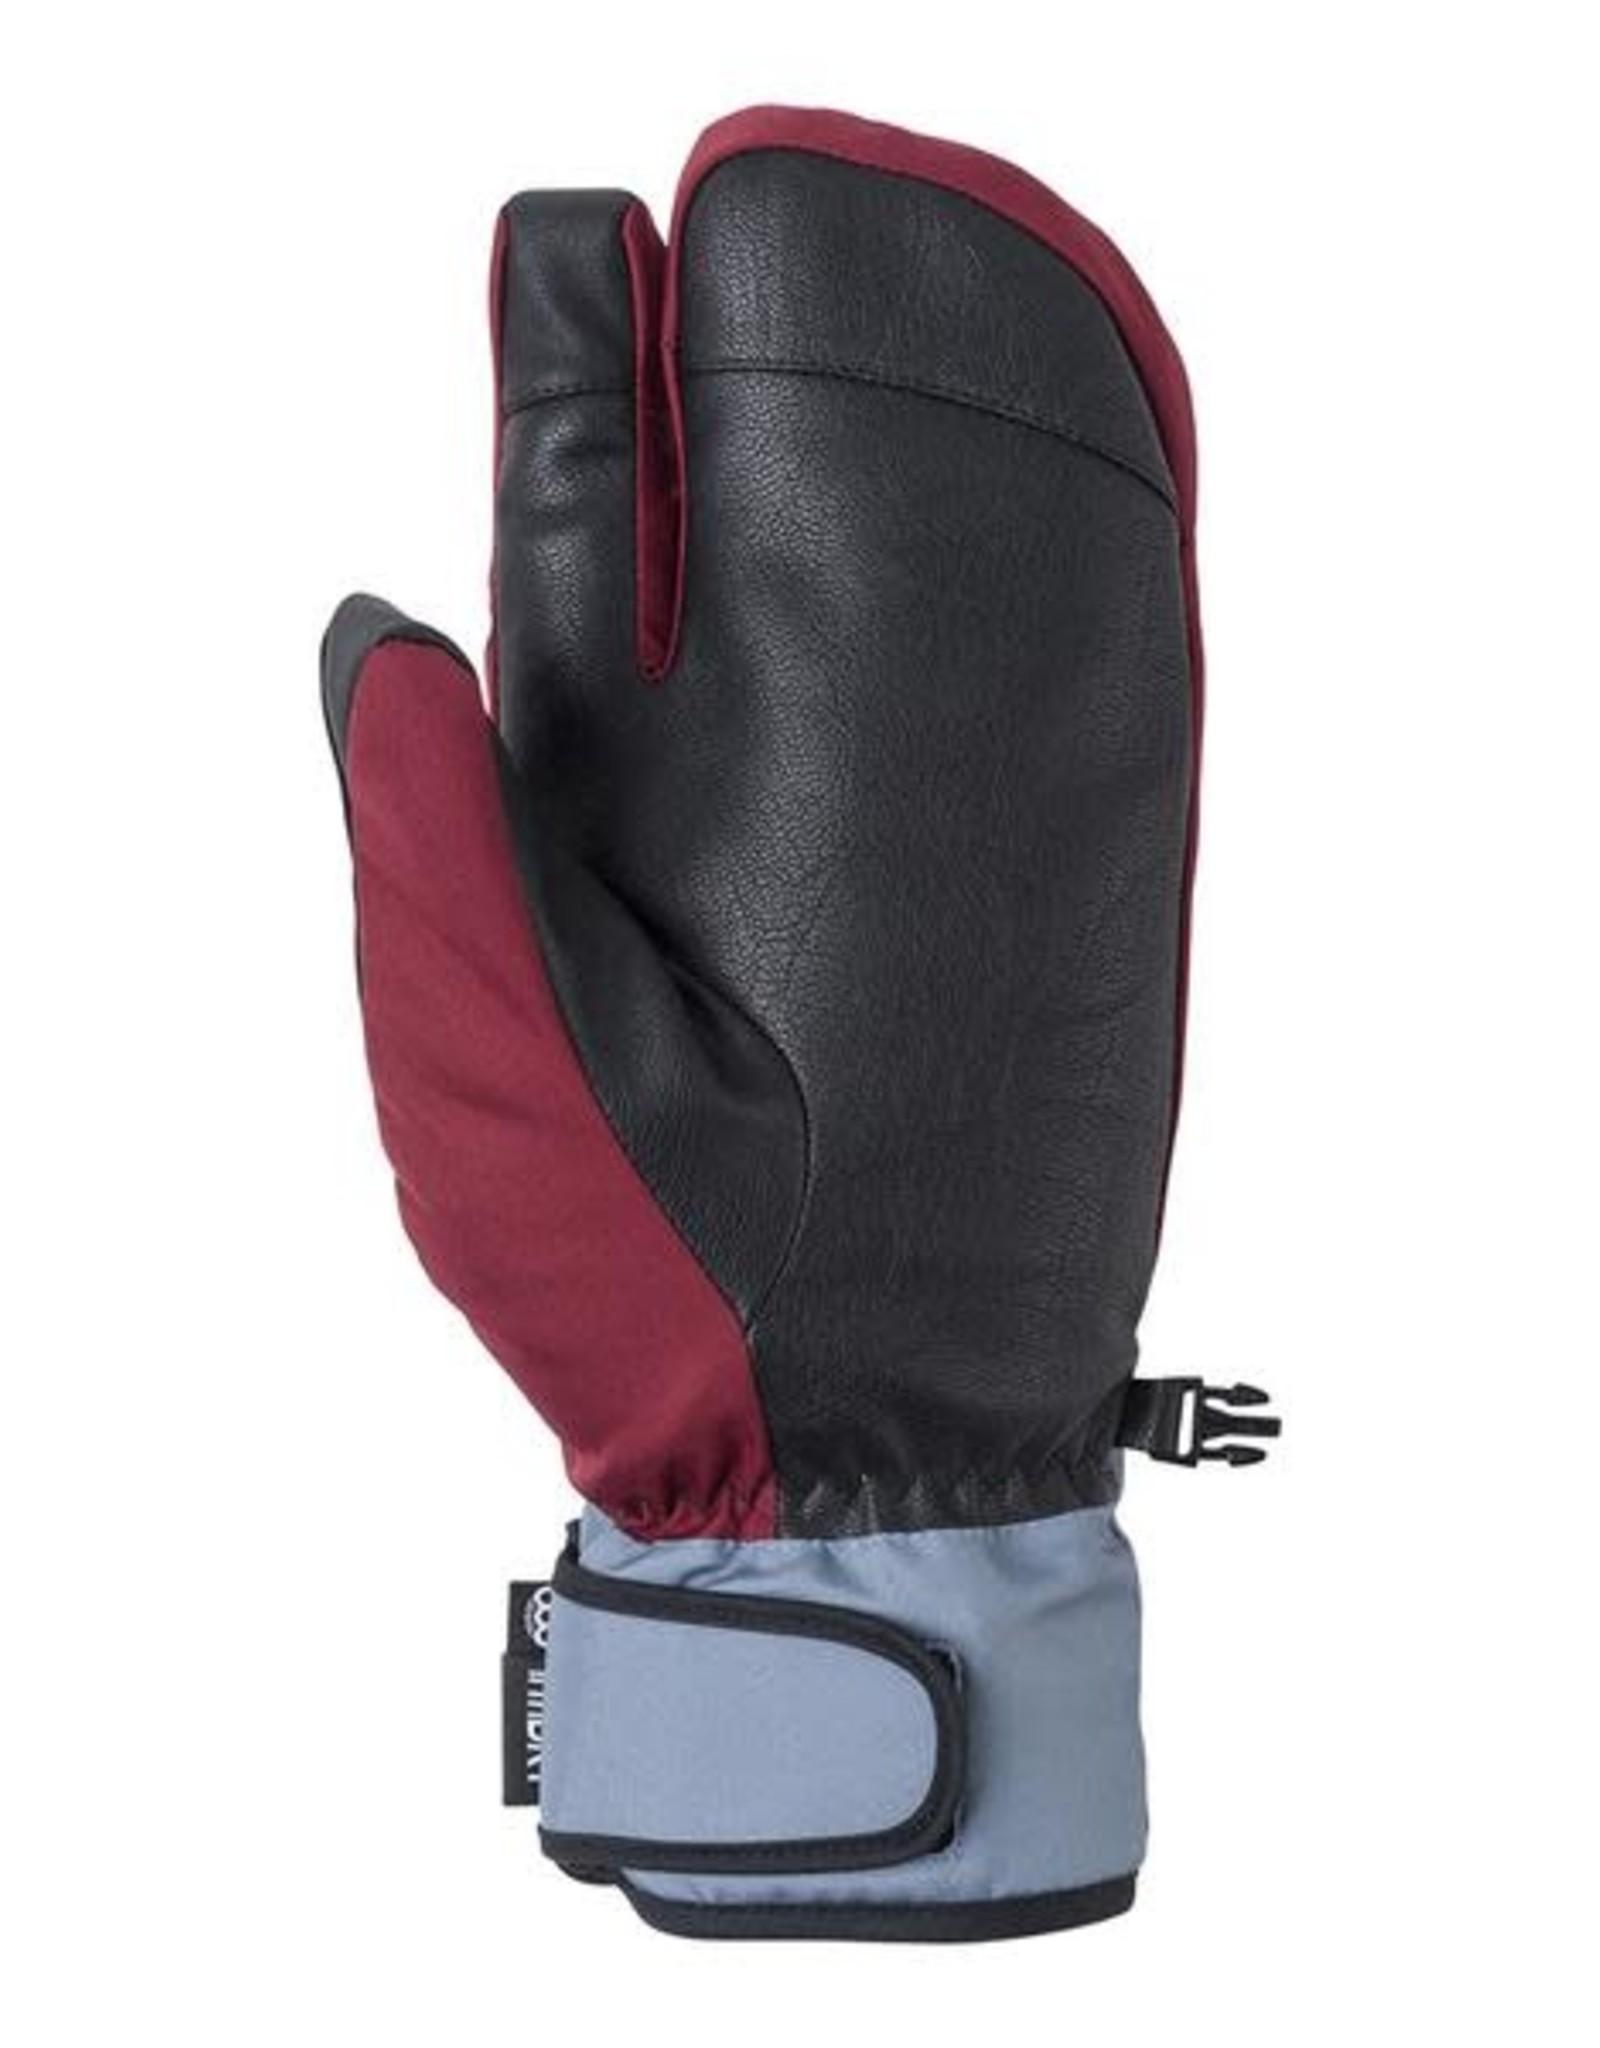 686 Infiloft Trigger Finger Mitt